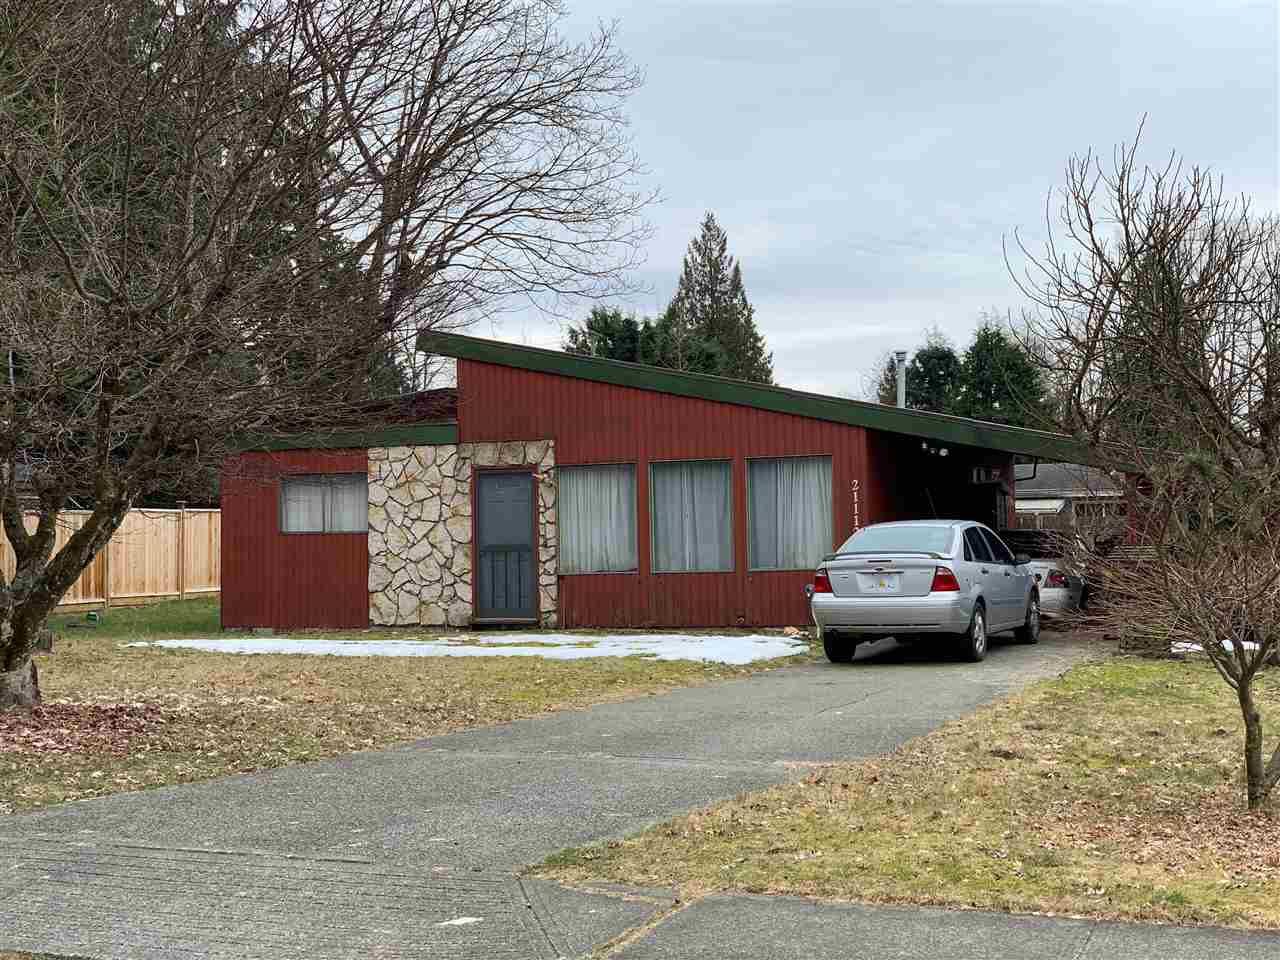 Main Photo: 21112 122 Avenue in Maple Ridge: Northwest Maple Ridge House for sale : MLS®# R2349138